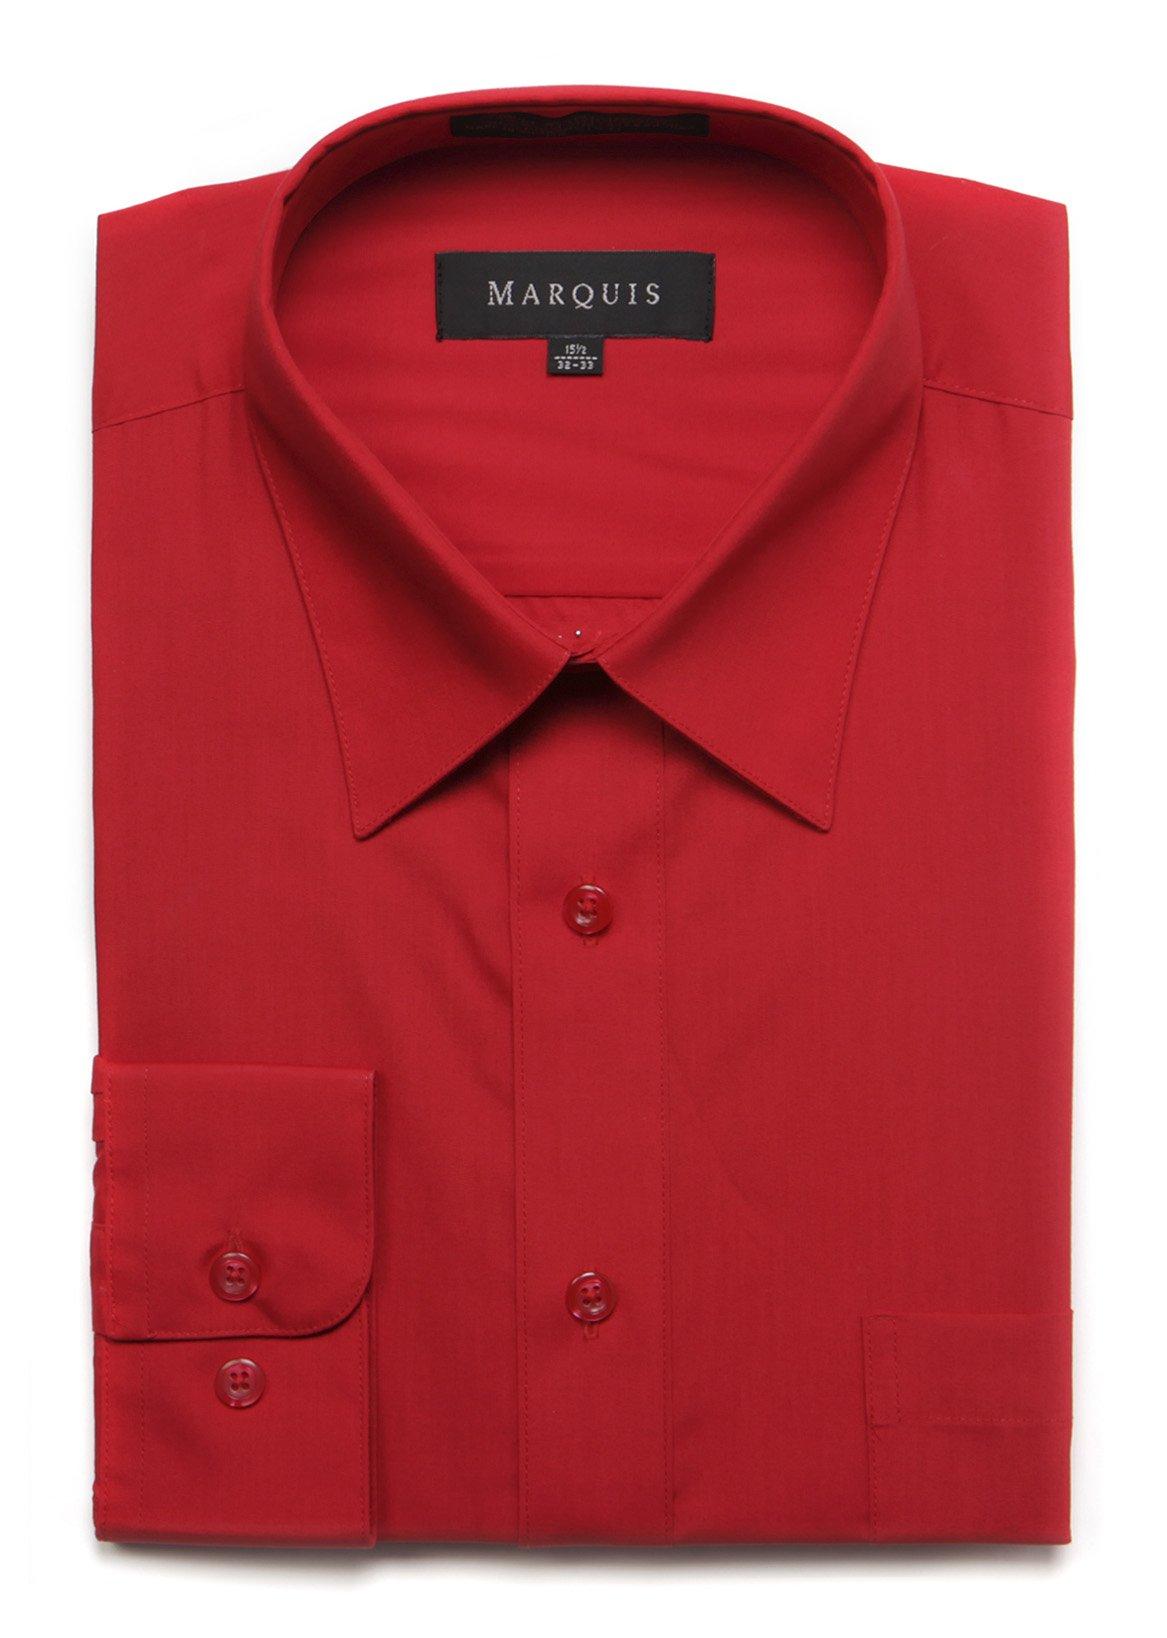 "Marquis Men's Basic Dress Shirt 18.5"" Neck / 34-35"" Sleeve Red"